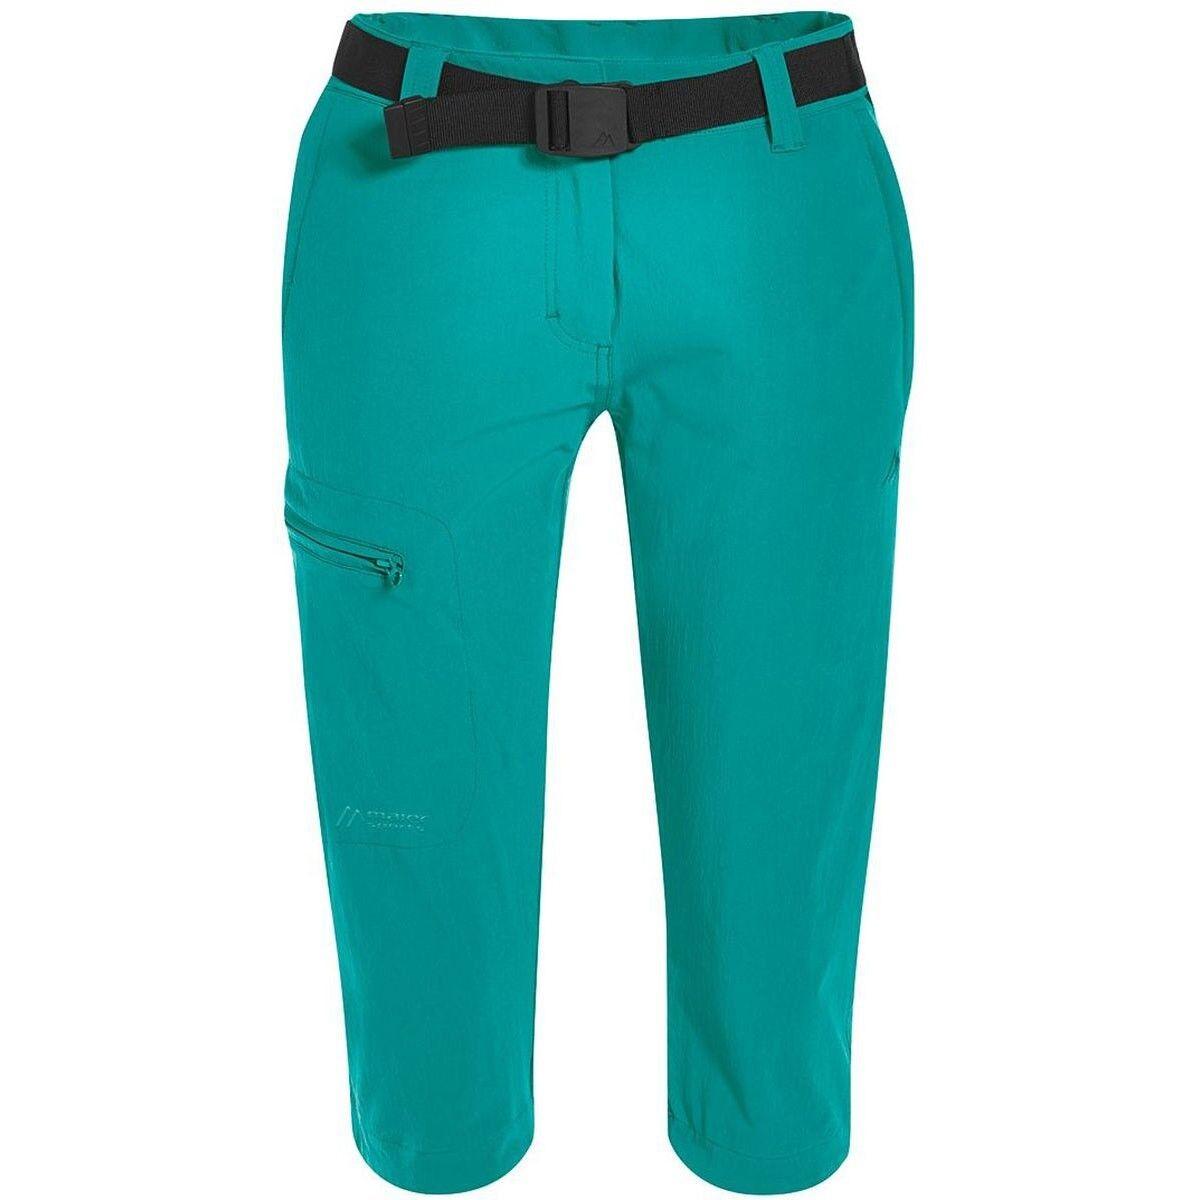 Maier Sports Inara Slim 3 4 DaMänner Wanderhose grün